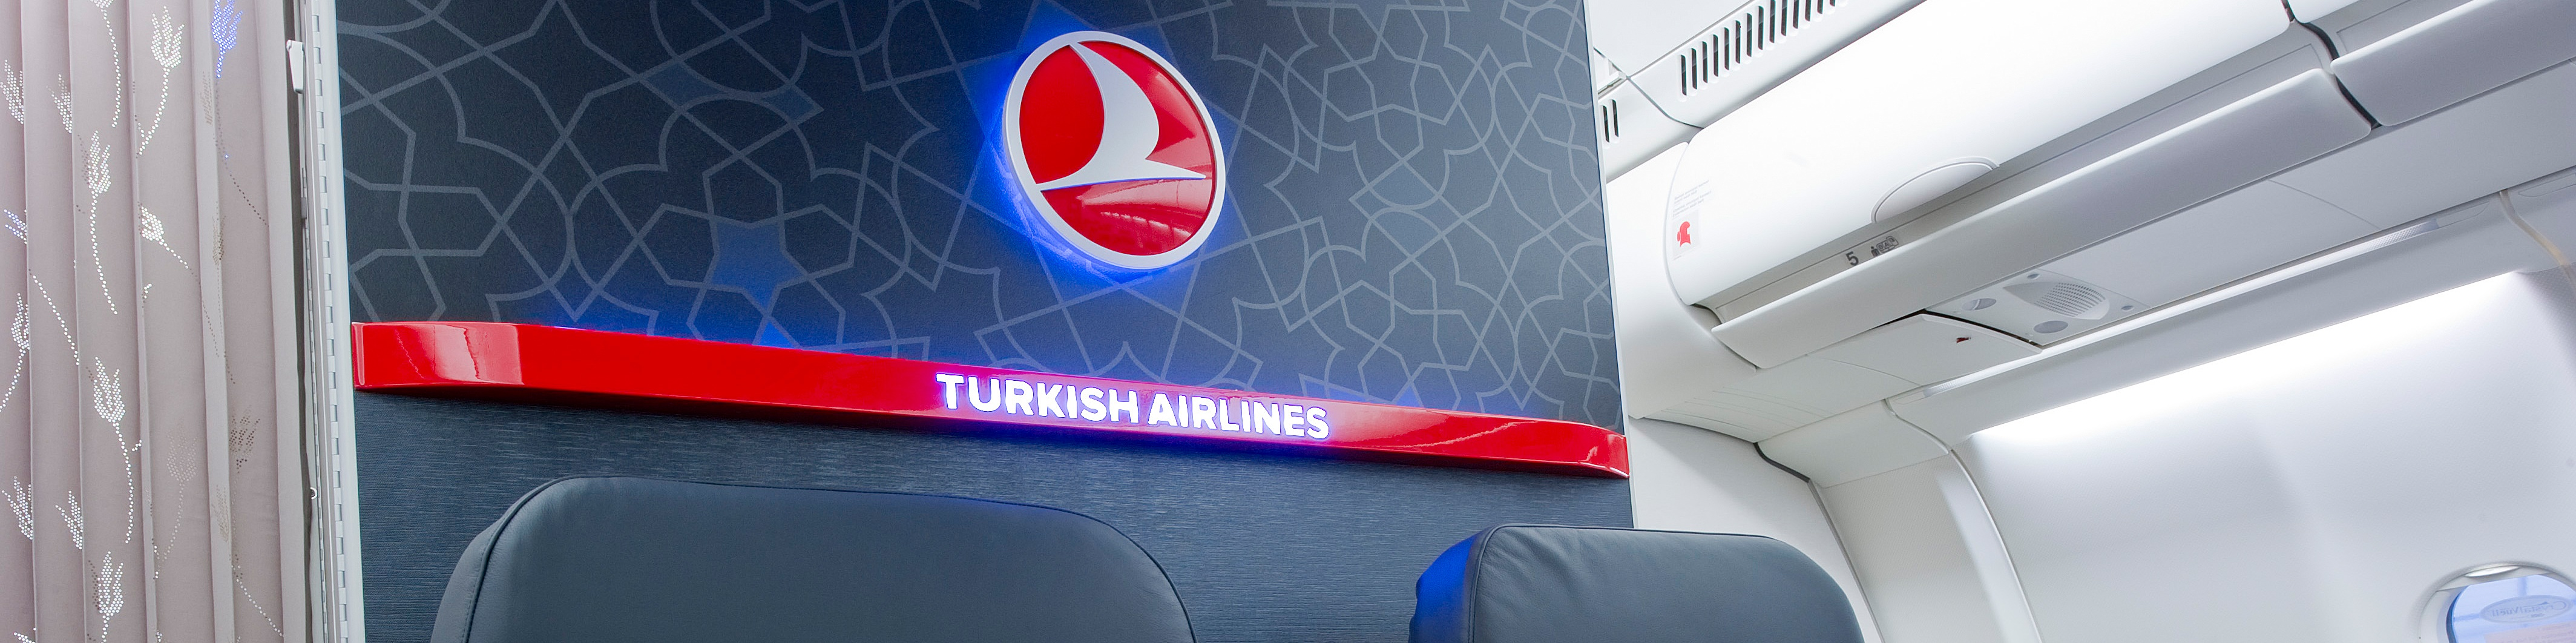 Turkish Airlines - Logo